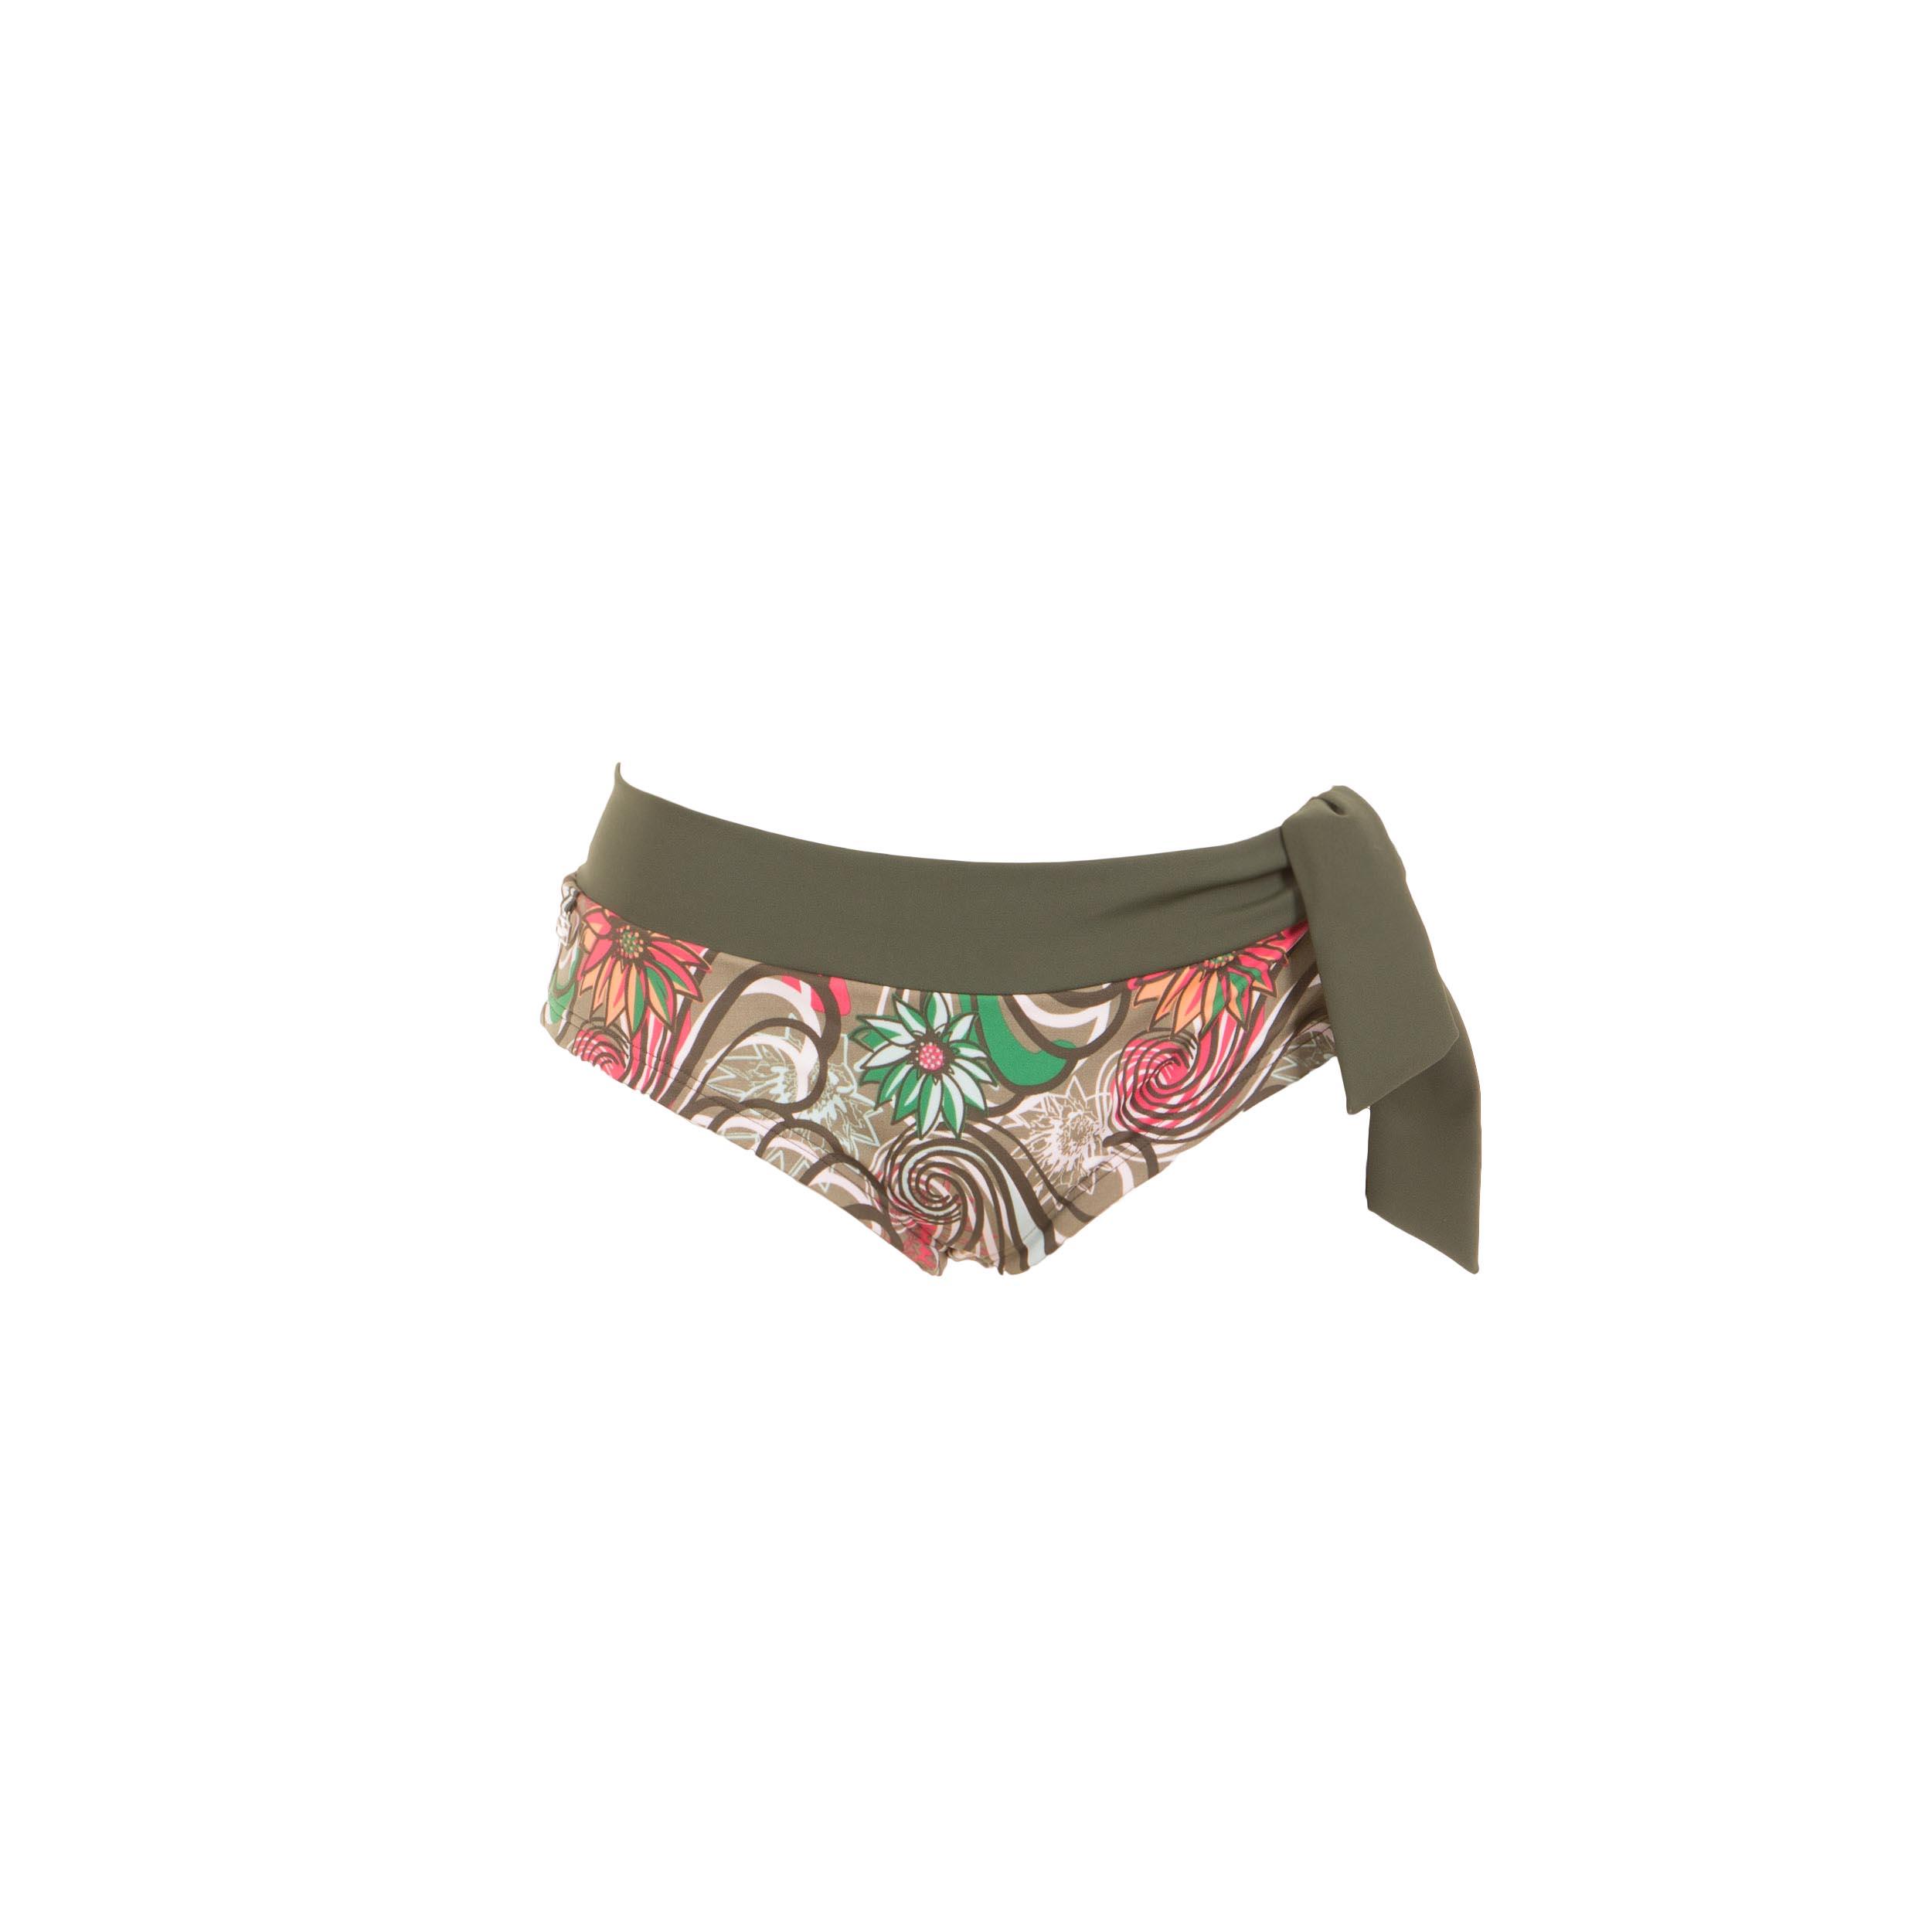 Bademode - O'Neill Bikini Hose olive Gr. 40  - Onlineshop Luxury Loft